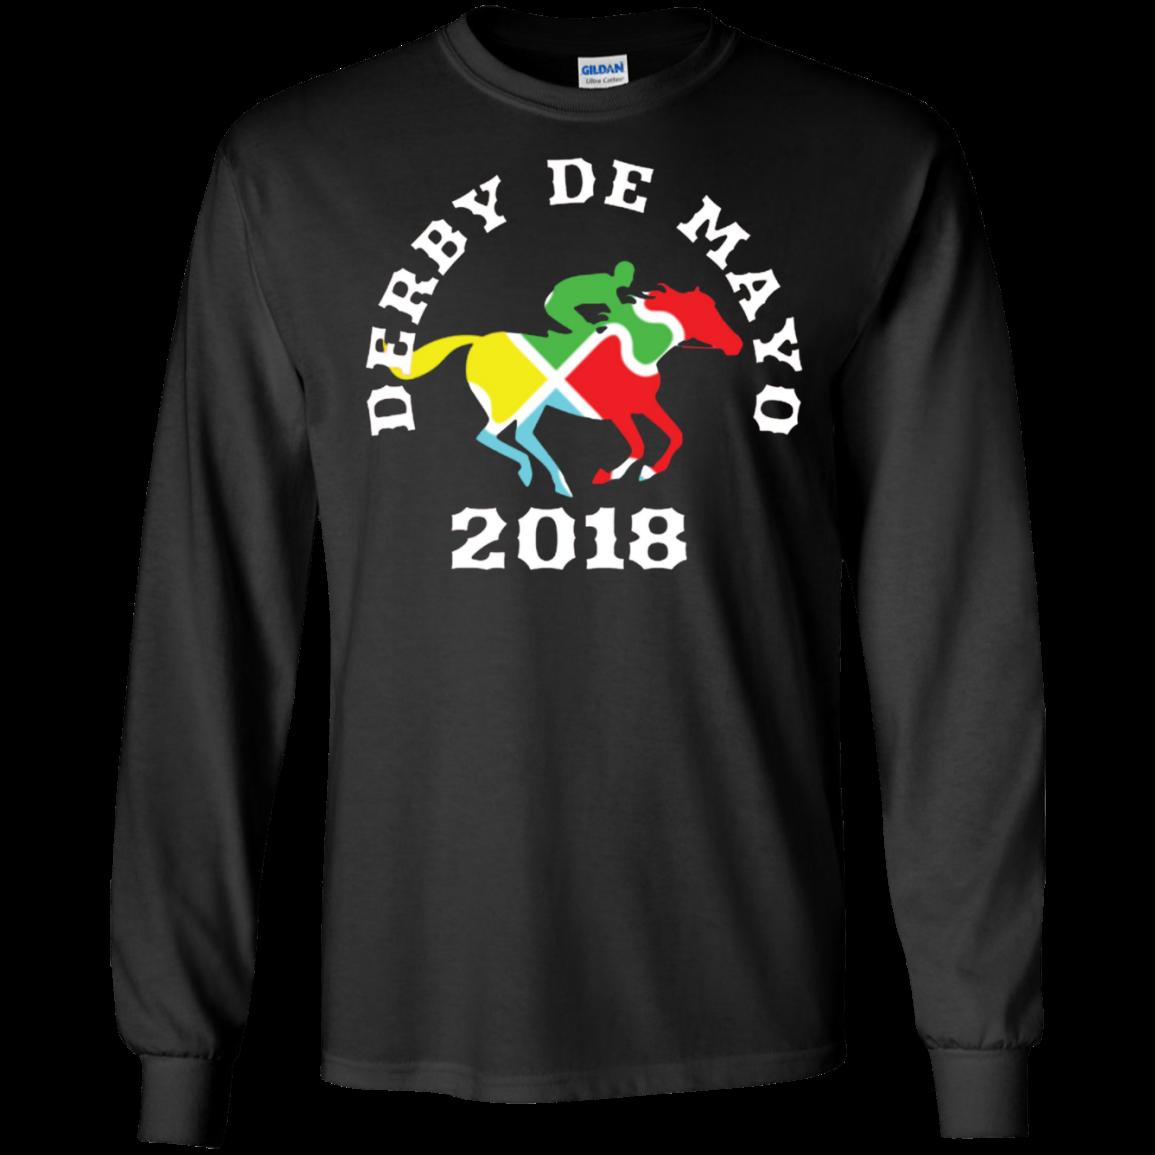 Kentucky Horse Race Mexican shirt Derby De Mayo Ultra Cotton shirt Men